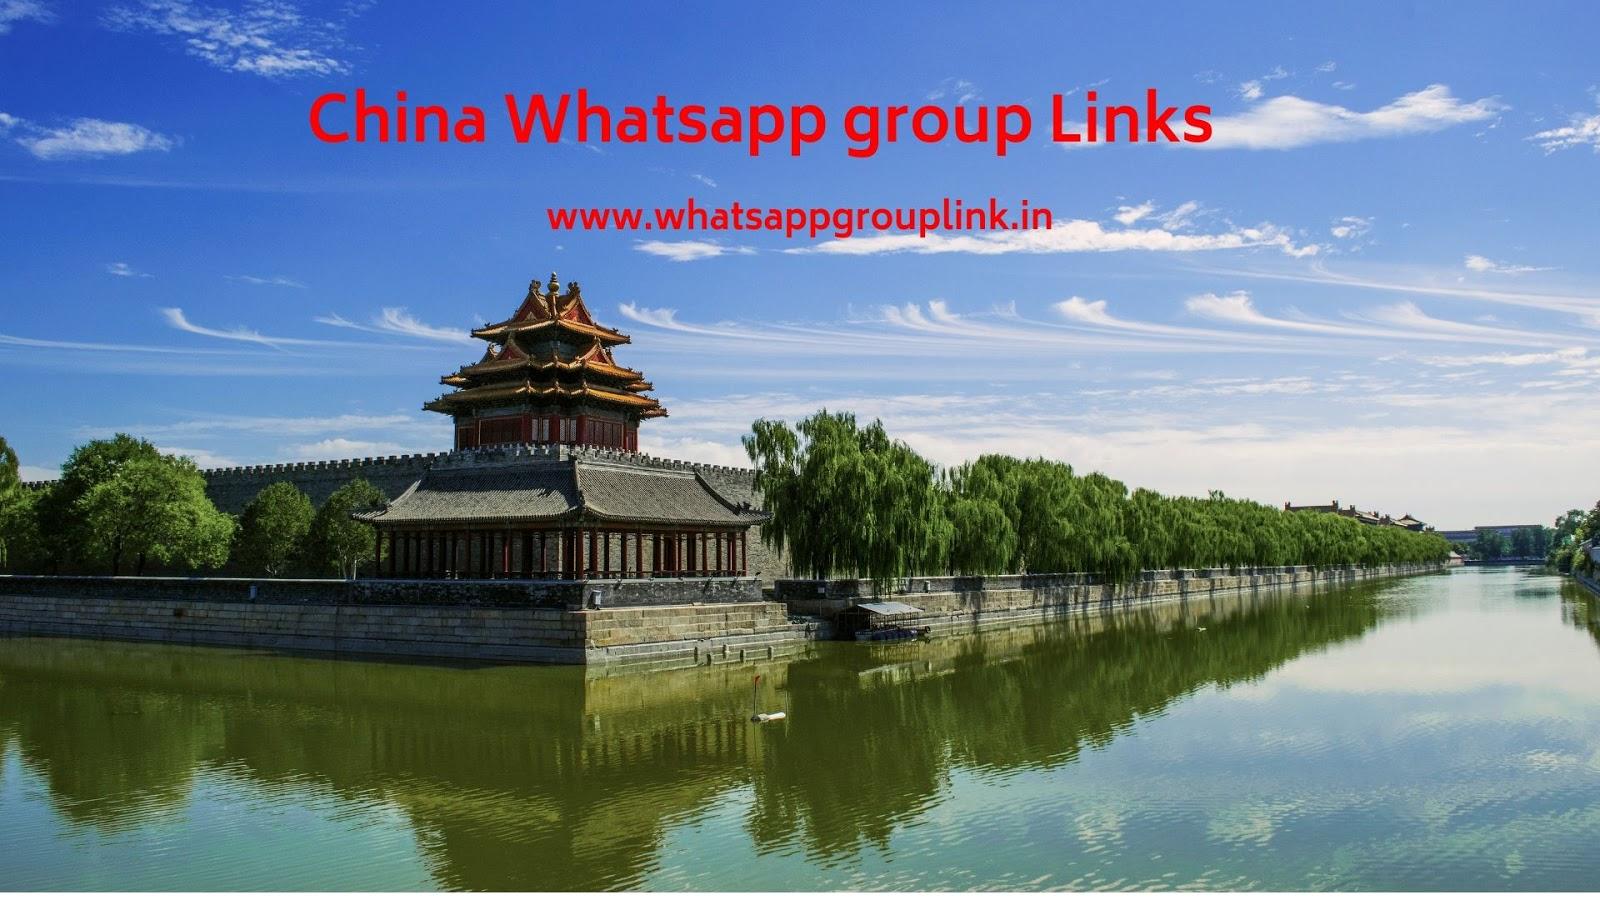 Whatsapp Group Link: China Whatsapp Group Links